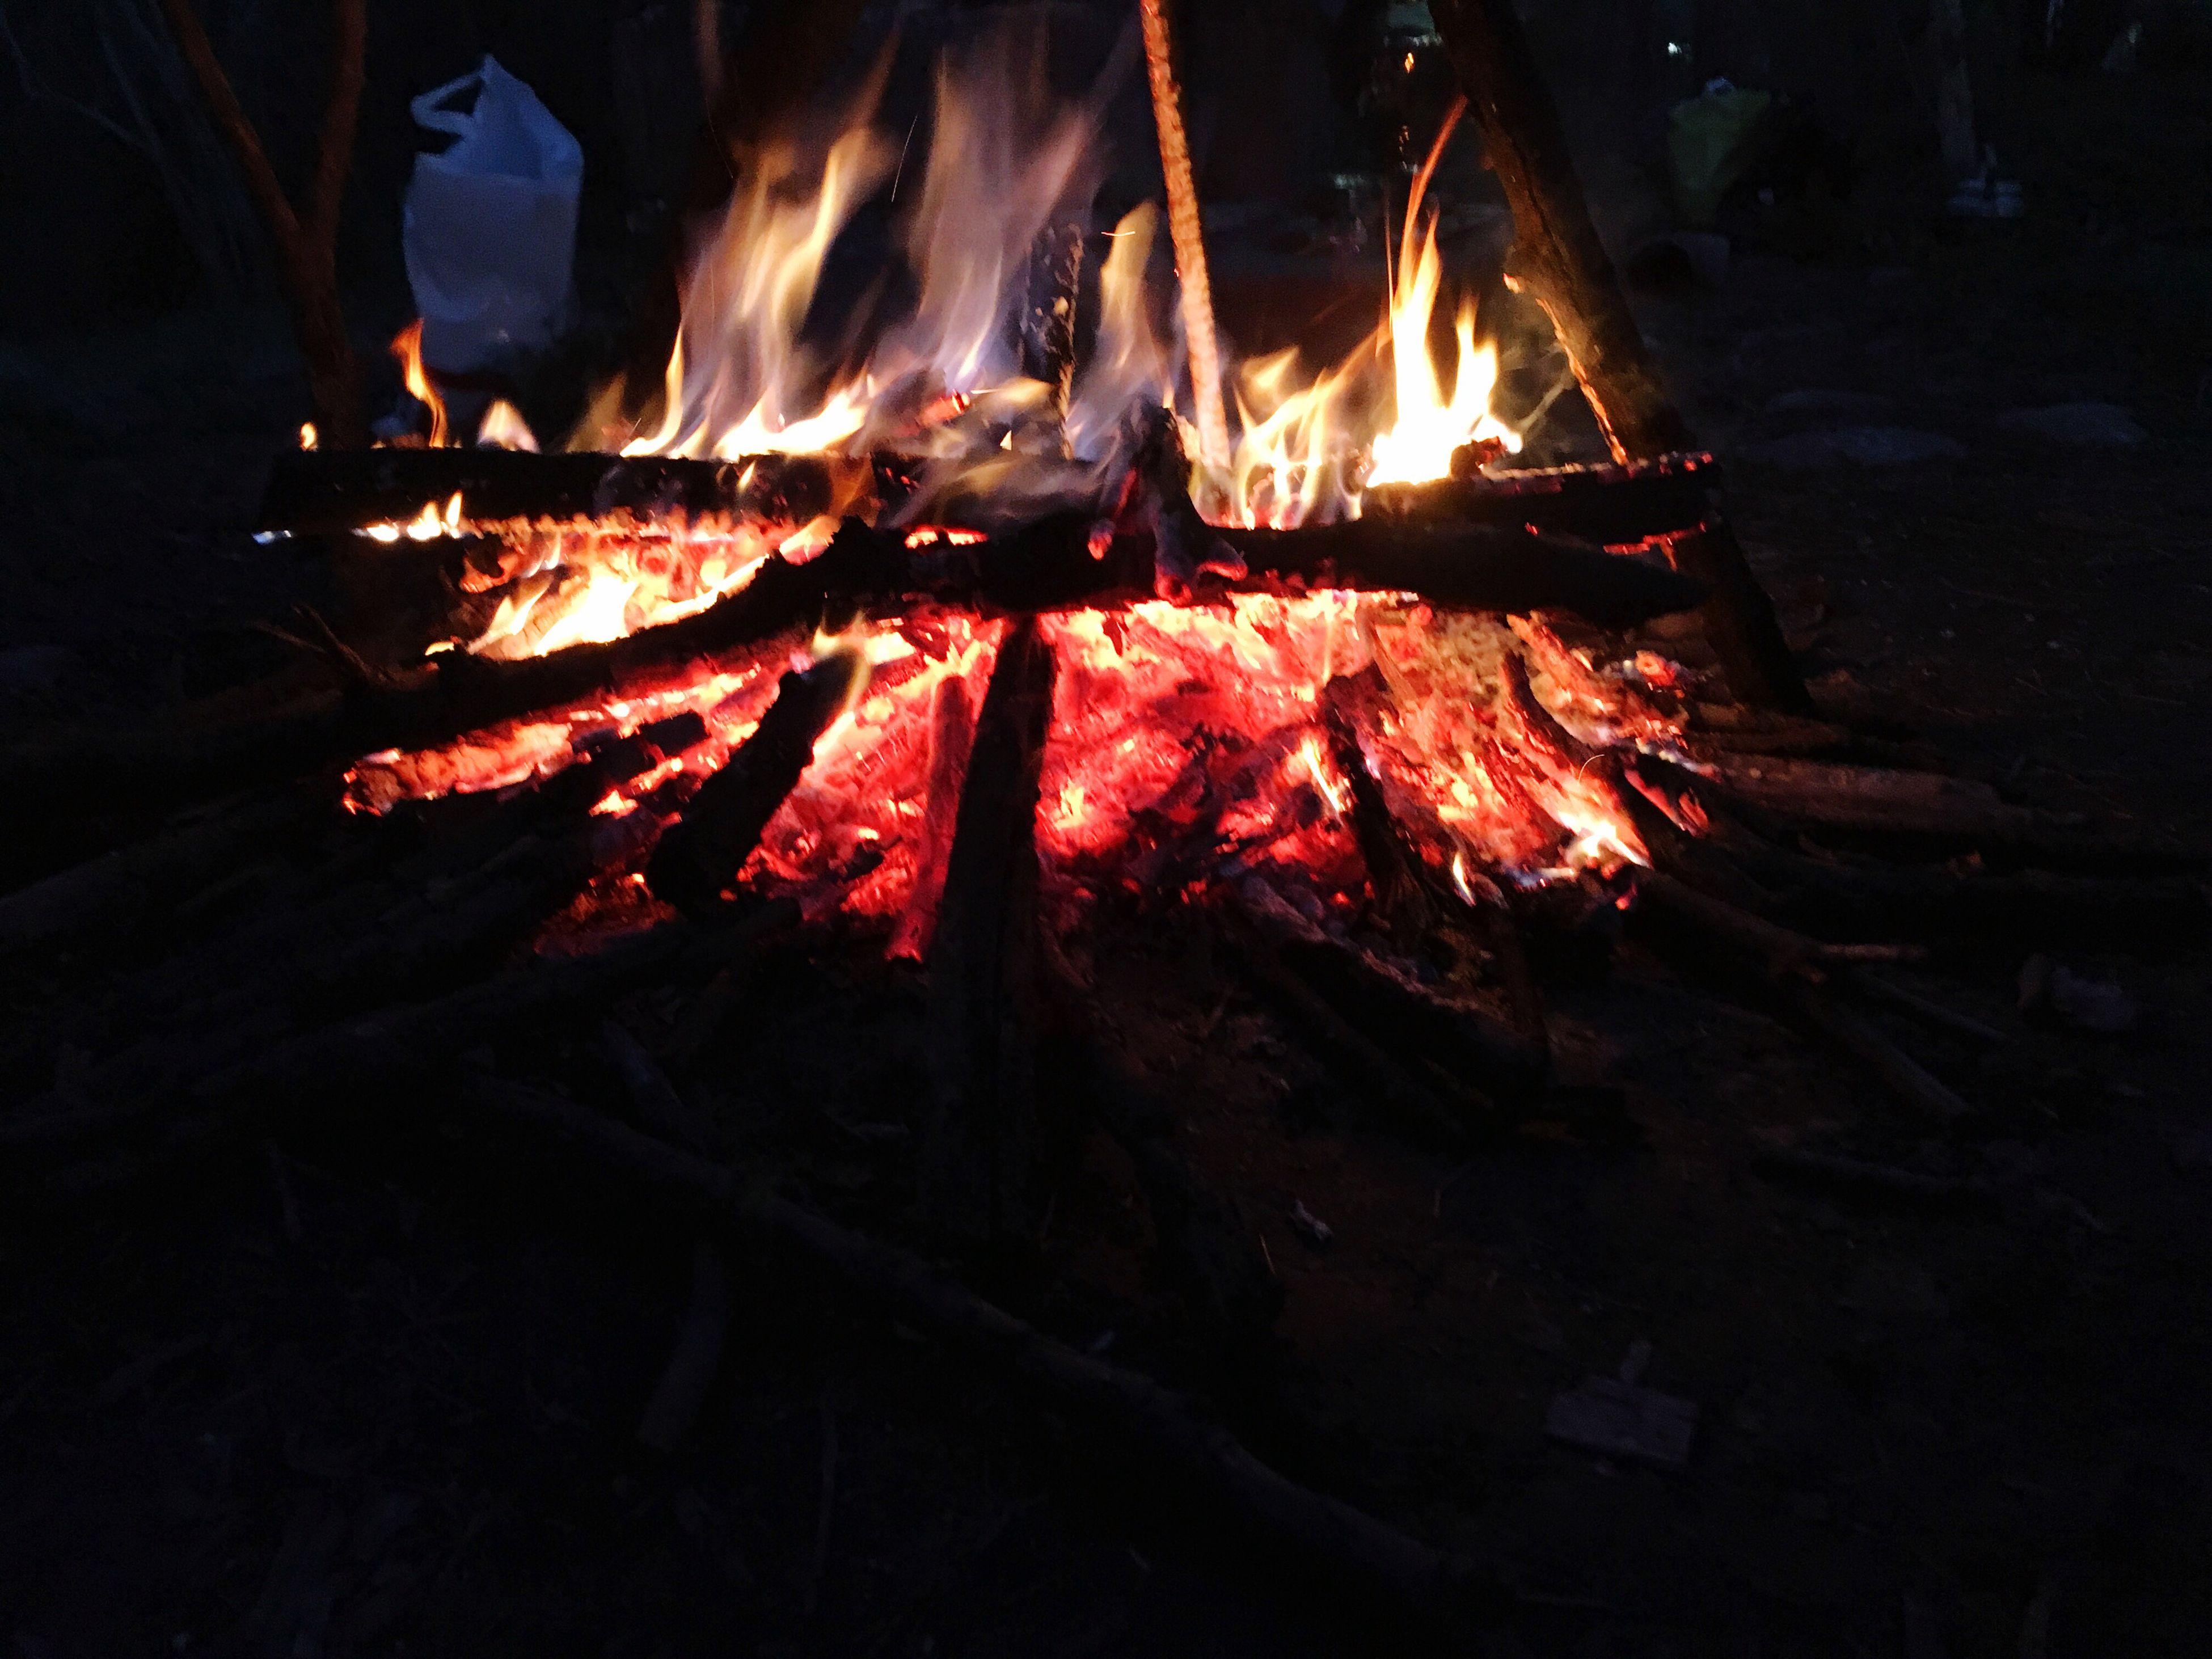 night, fire - natural phenomenon, burning, flame, heat - temperature, glowing, illuminated, bonfire, fire, firewood, motion, long exposure, dark, wood - material, campfire, close-up, outdoors, orange color, no people, light - natural phenomenon